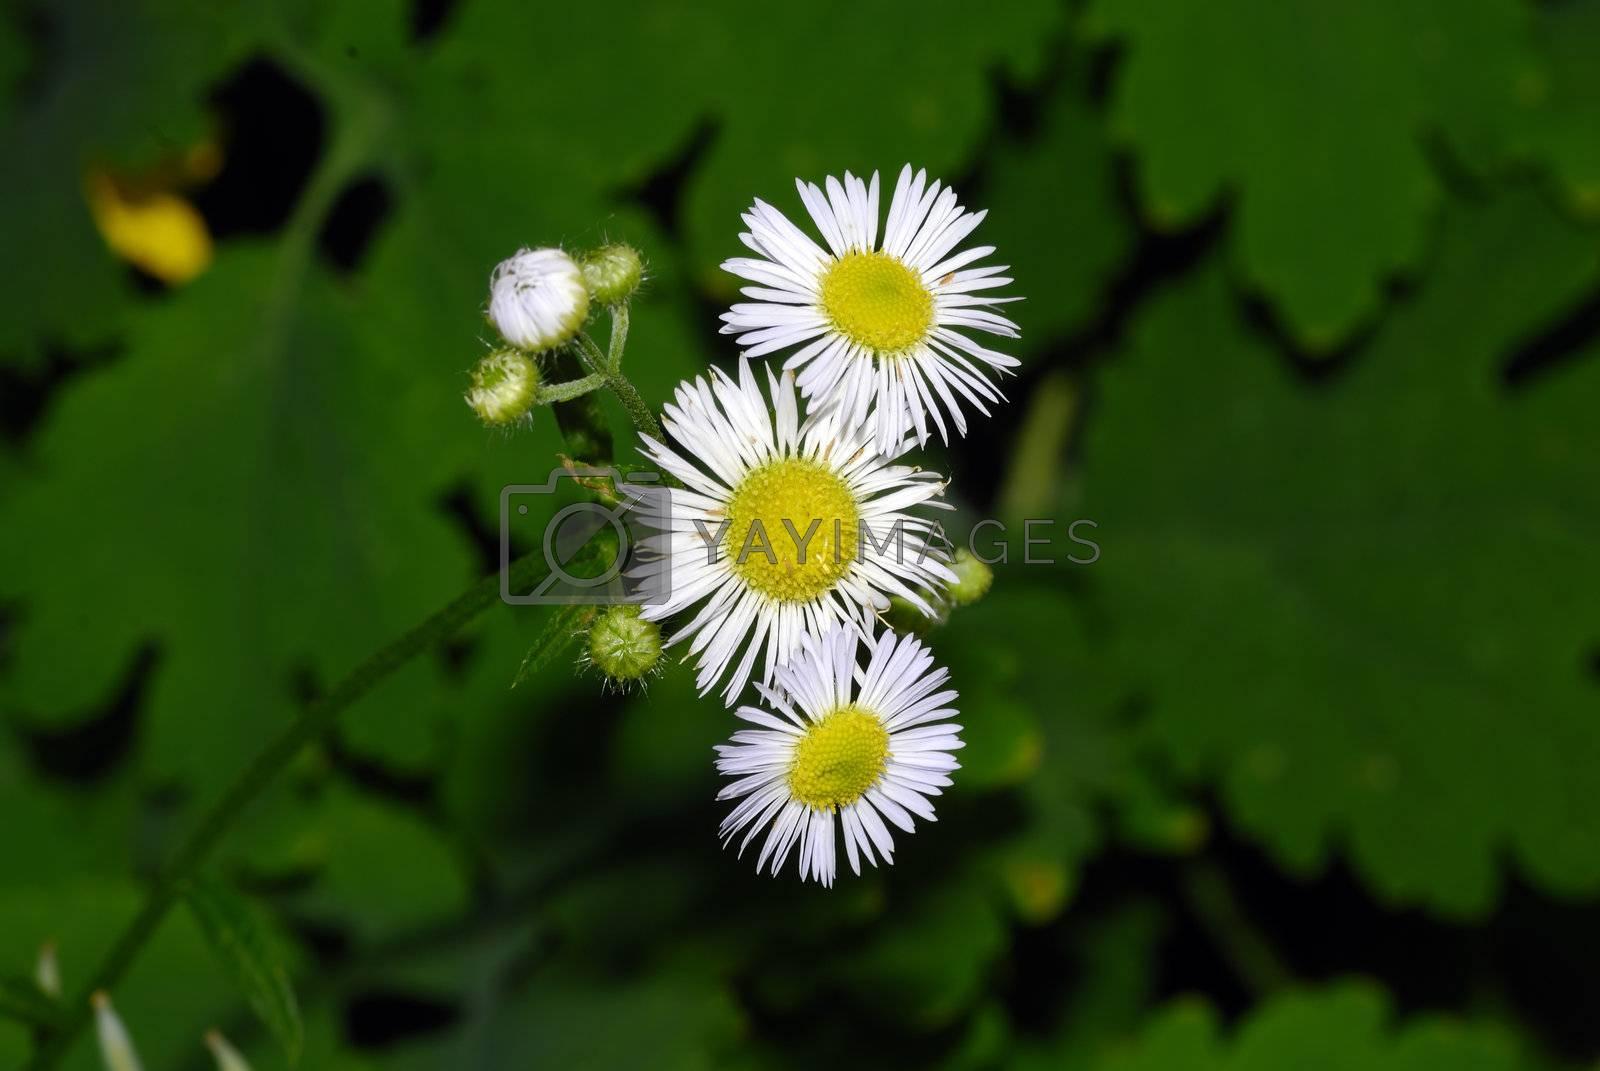 Weeds by pazham